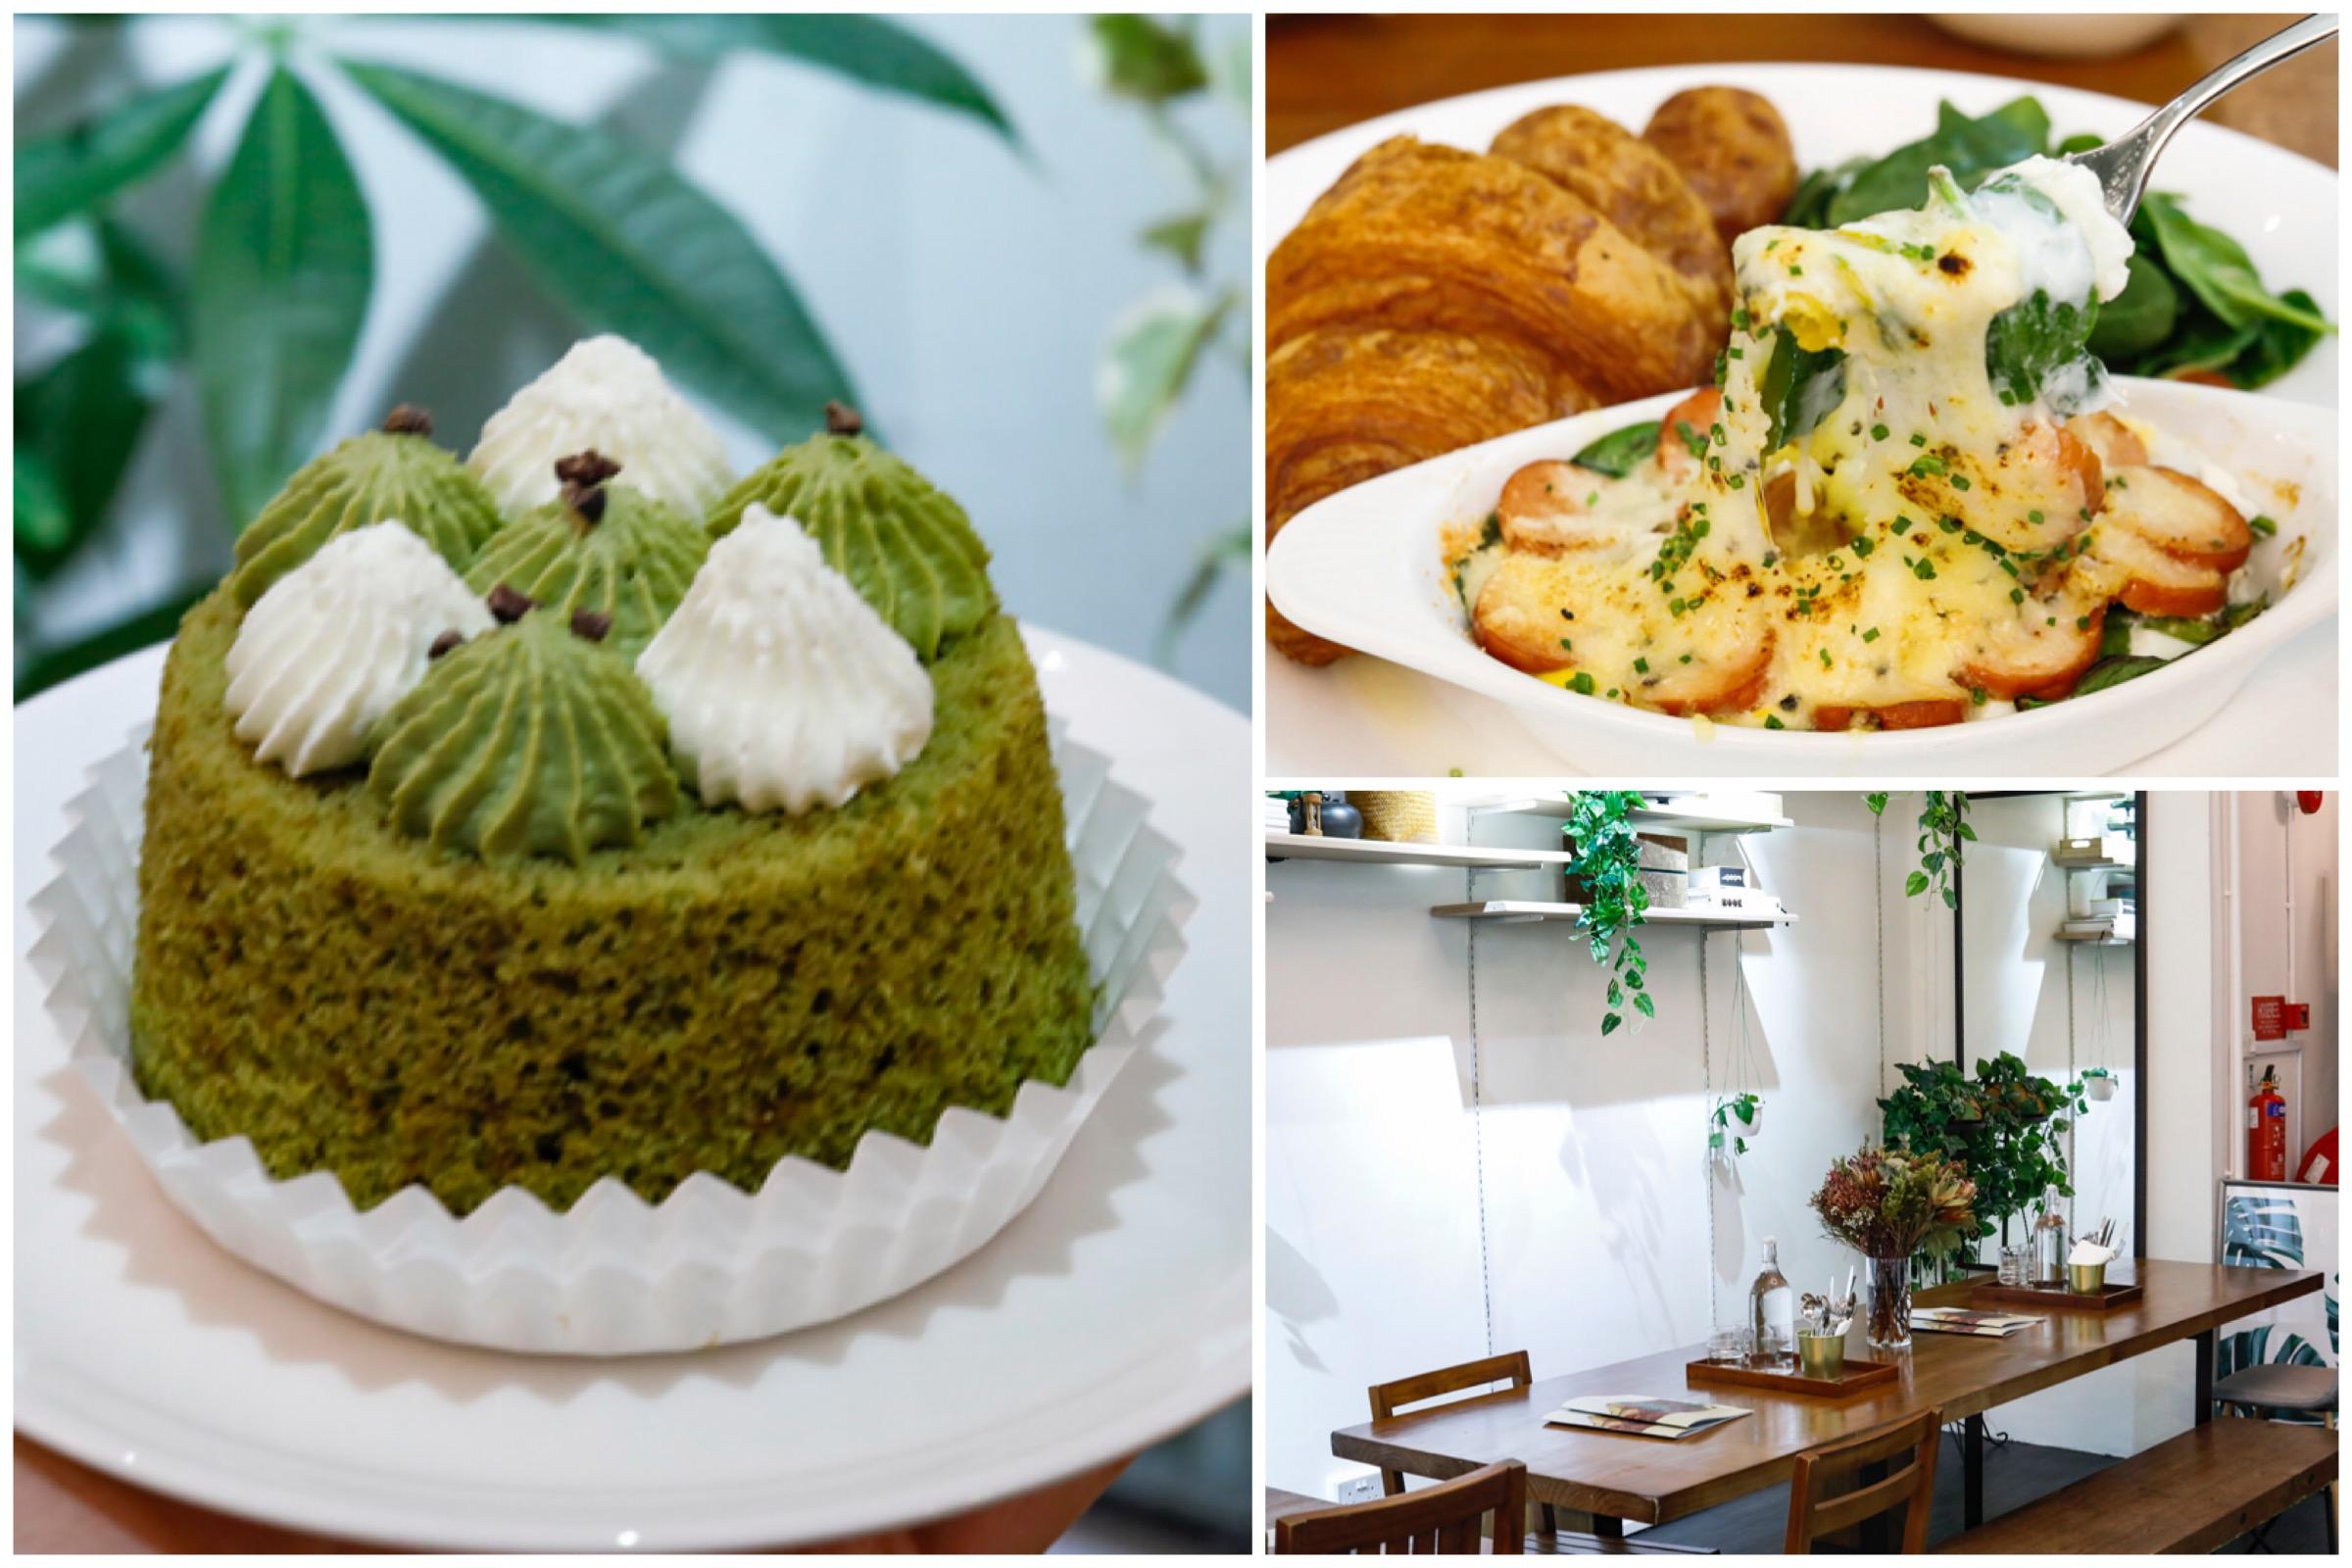 Kokoro - Wholesome Food And Matcha Chiffon In A NEW Cafe Near Bugis